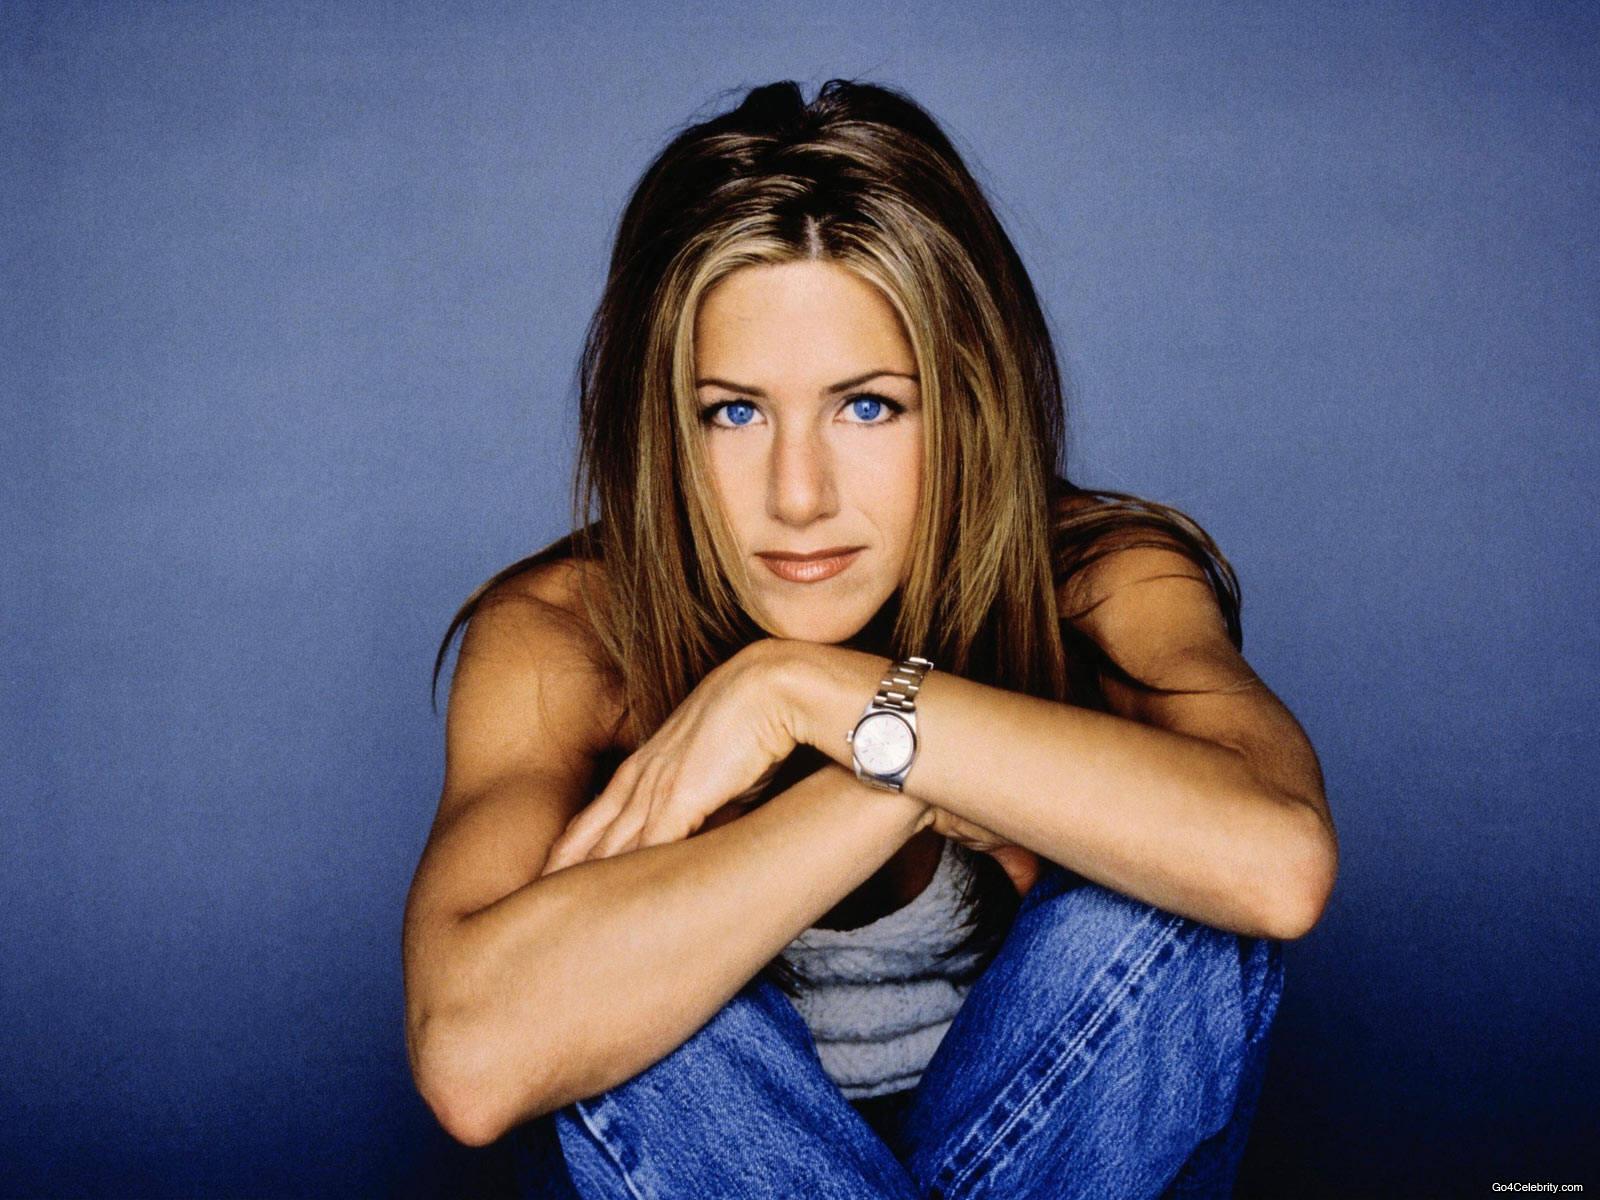 Jennifer-Aniston-jennifer-aniston-81355_1600_1200